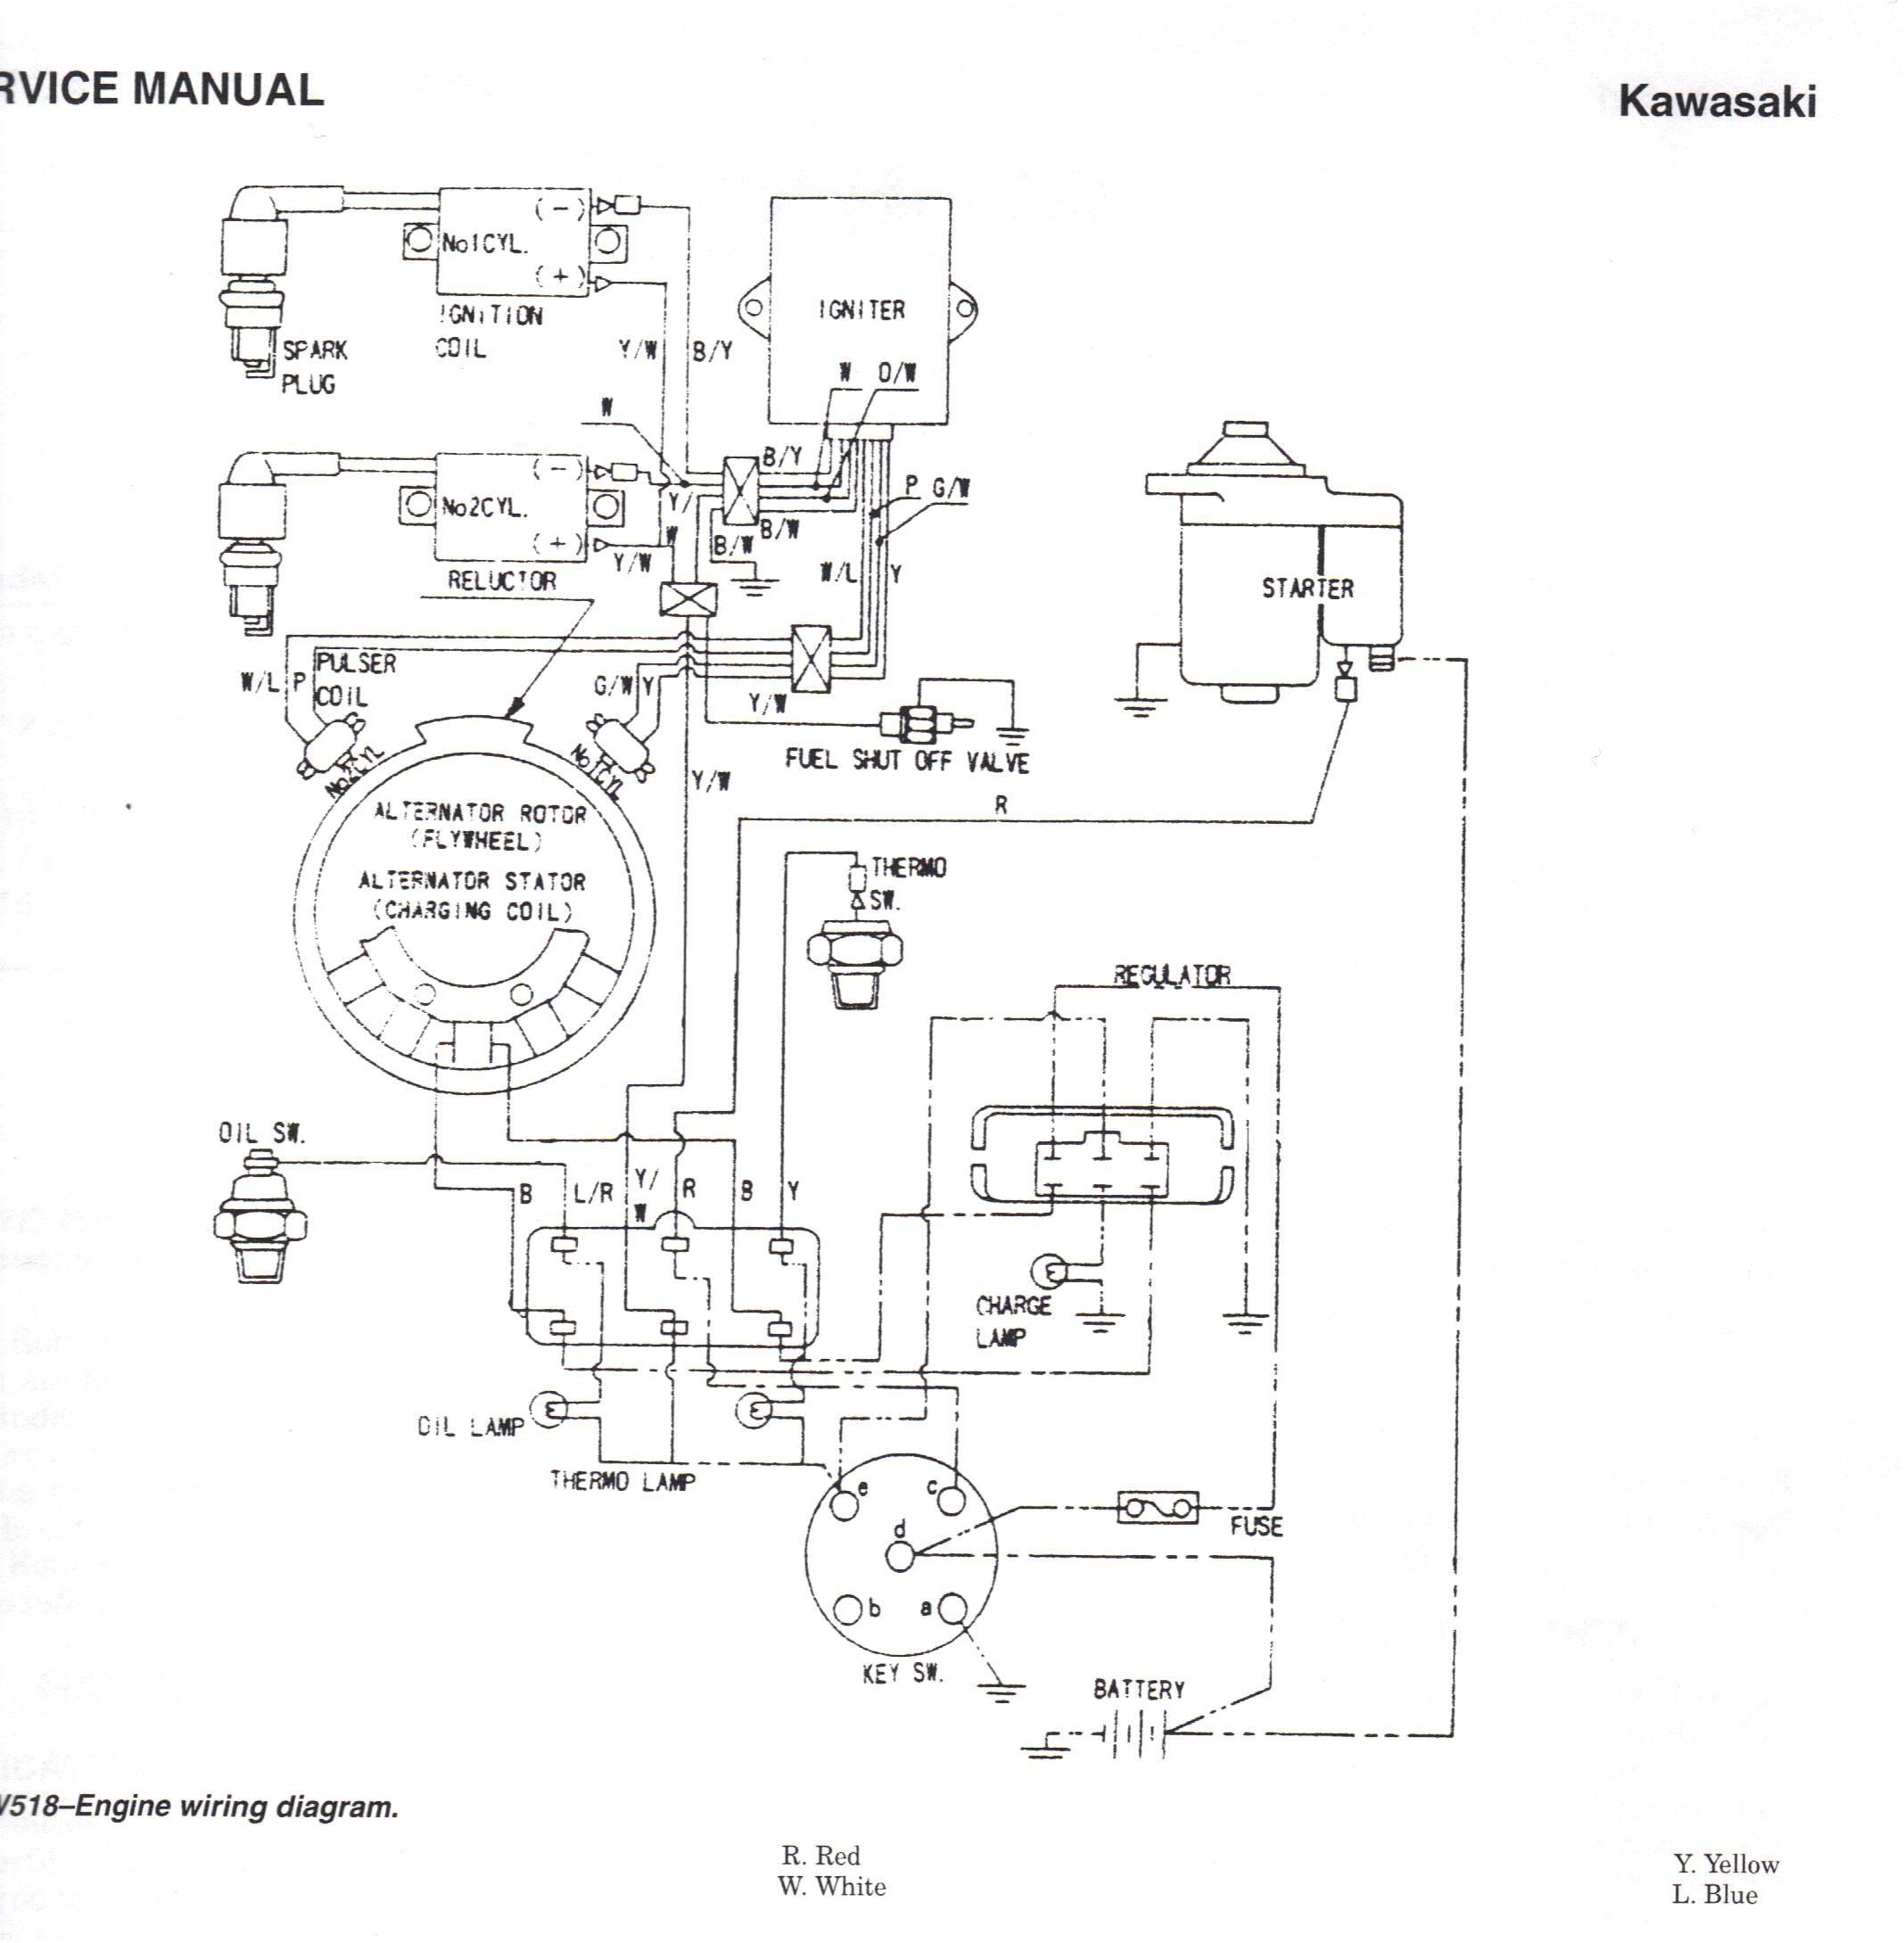 diagram] john deere f525 wiring diagram full version hd quality wiring  diagram - carbonphasediagram.lexibelle.fr  lexibelle.fr